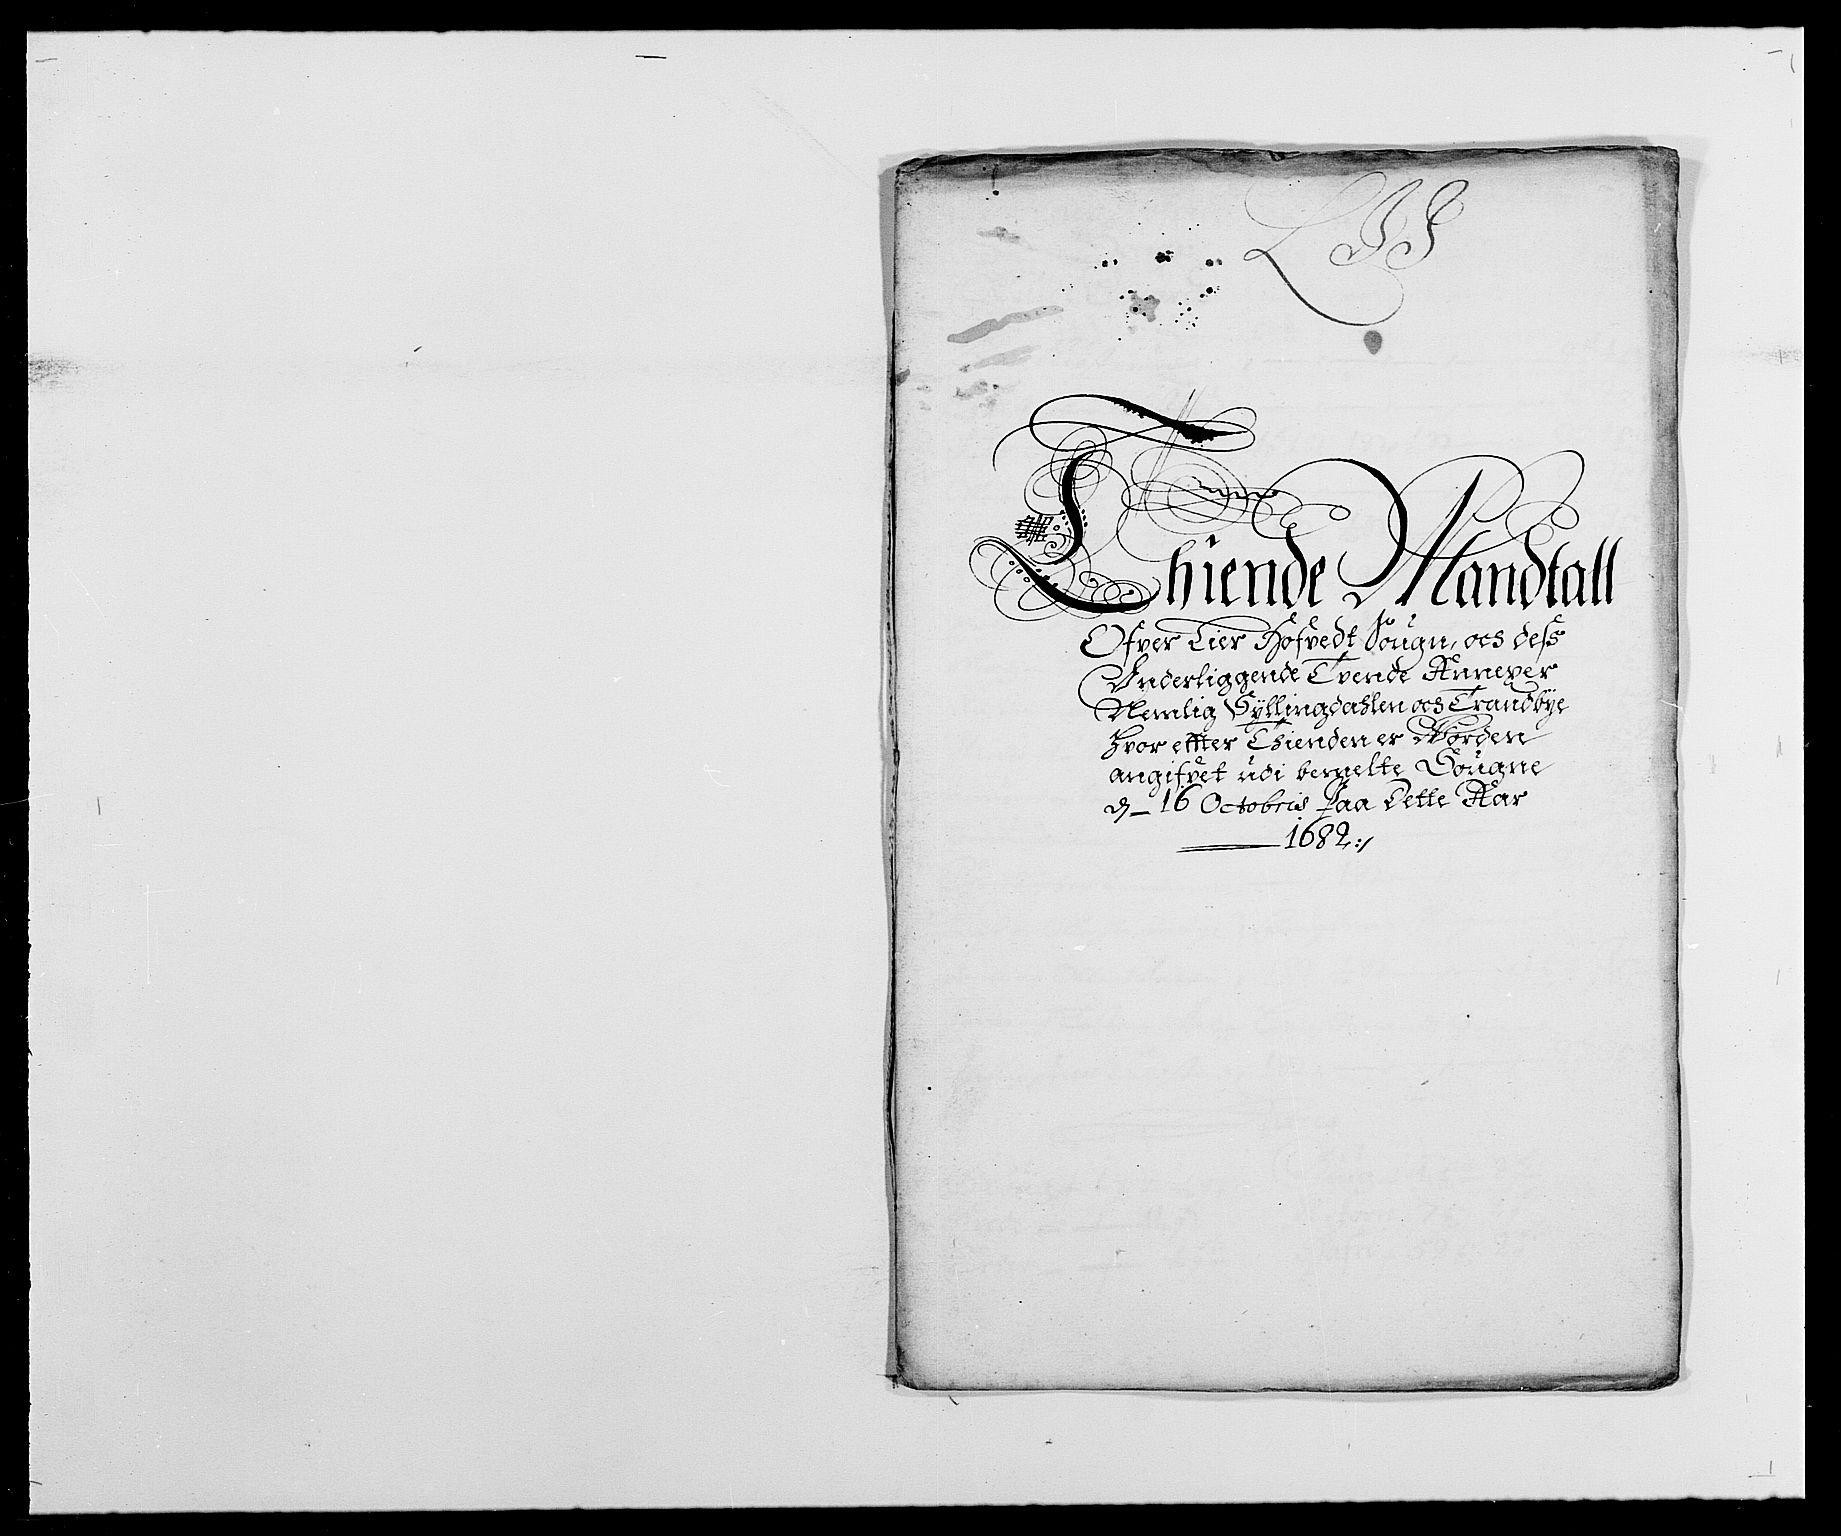 RA, Rentekammeret inntil 1814, Reviderte regnskaper, Fogderegnskap, R27/L1686: Fogderegnskap Lier, 1678-1686, s. 372